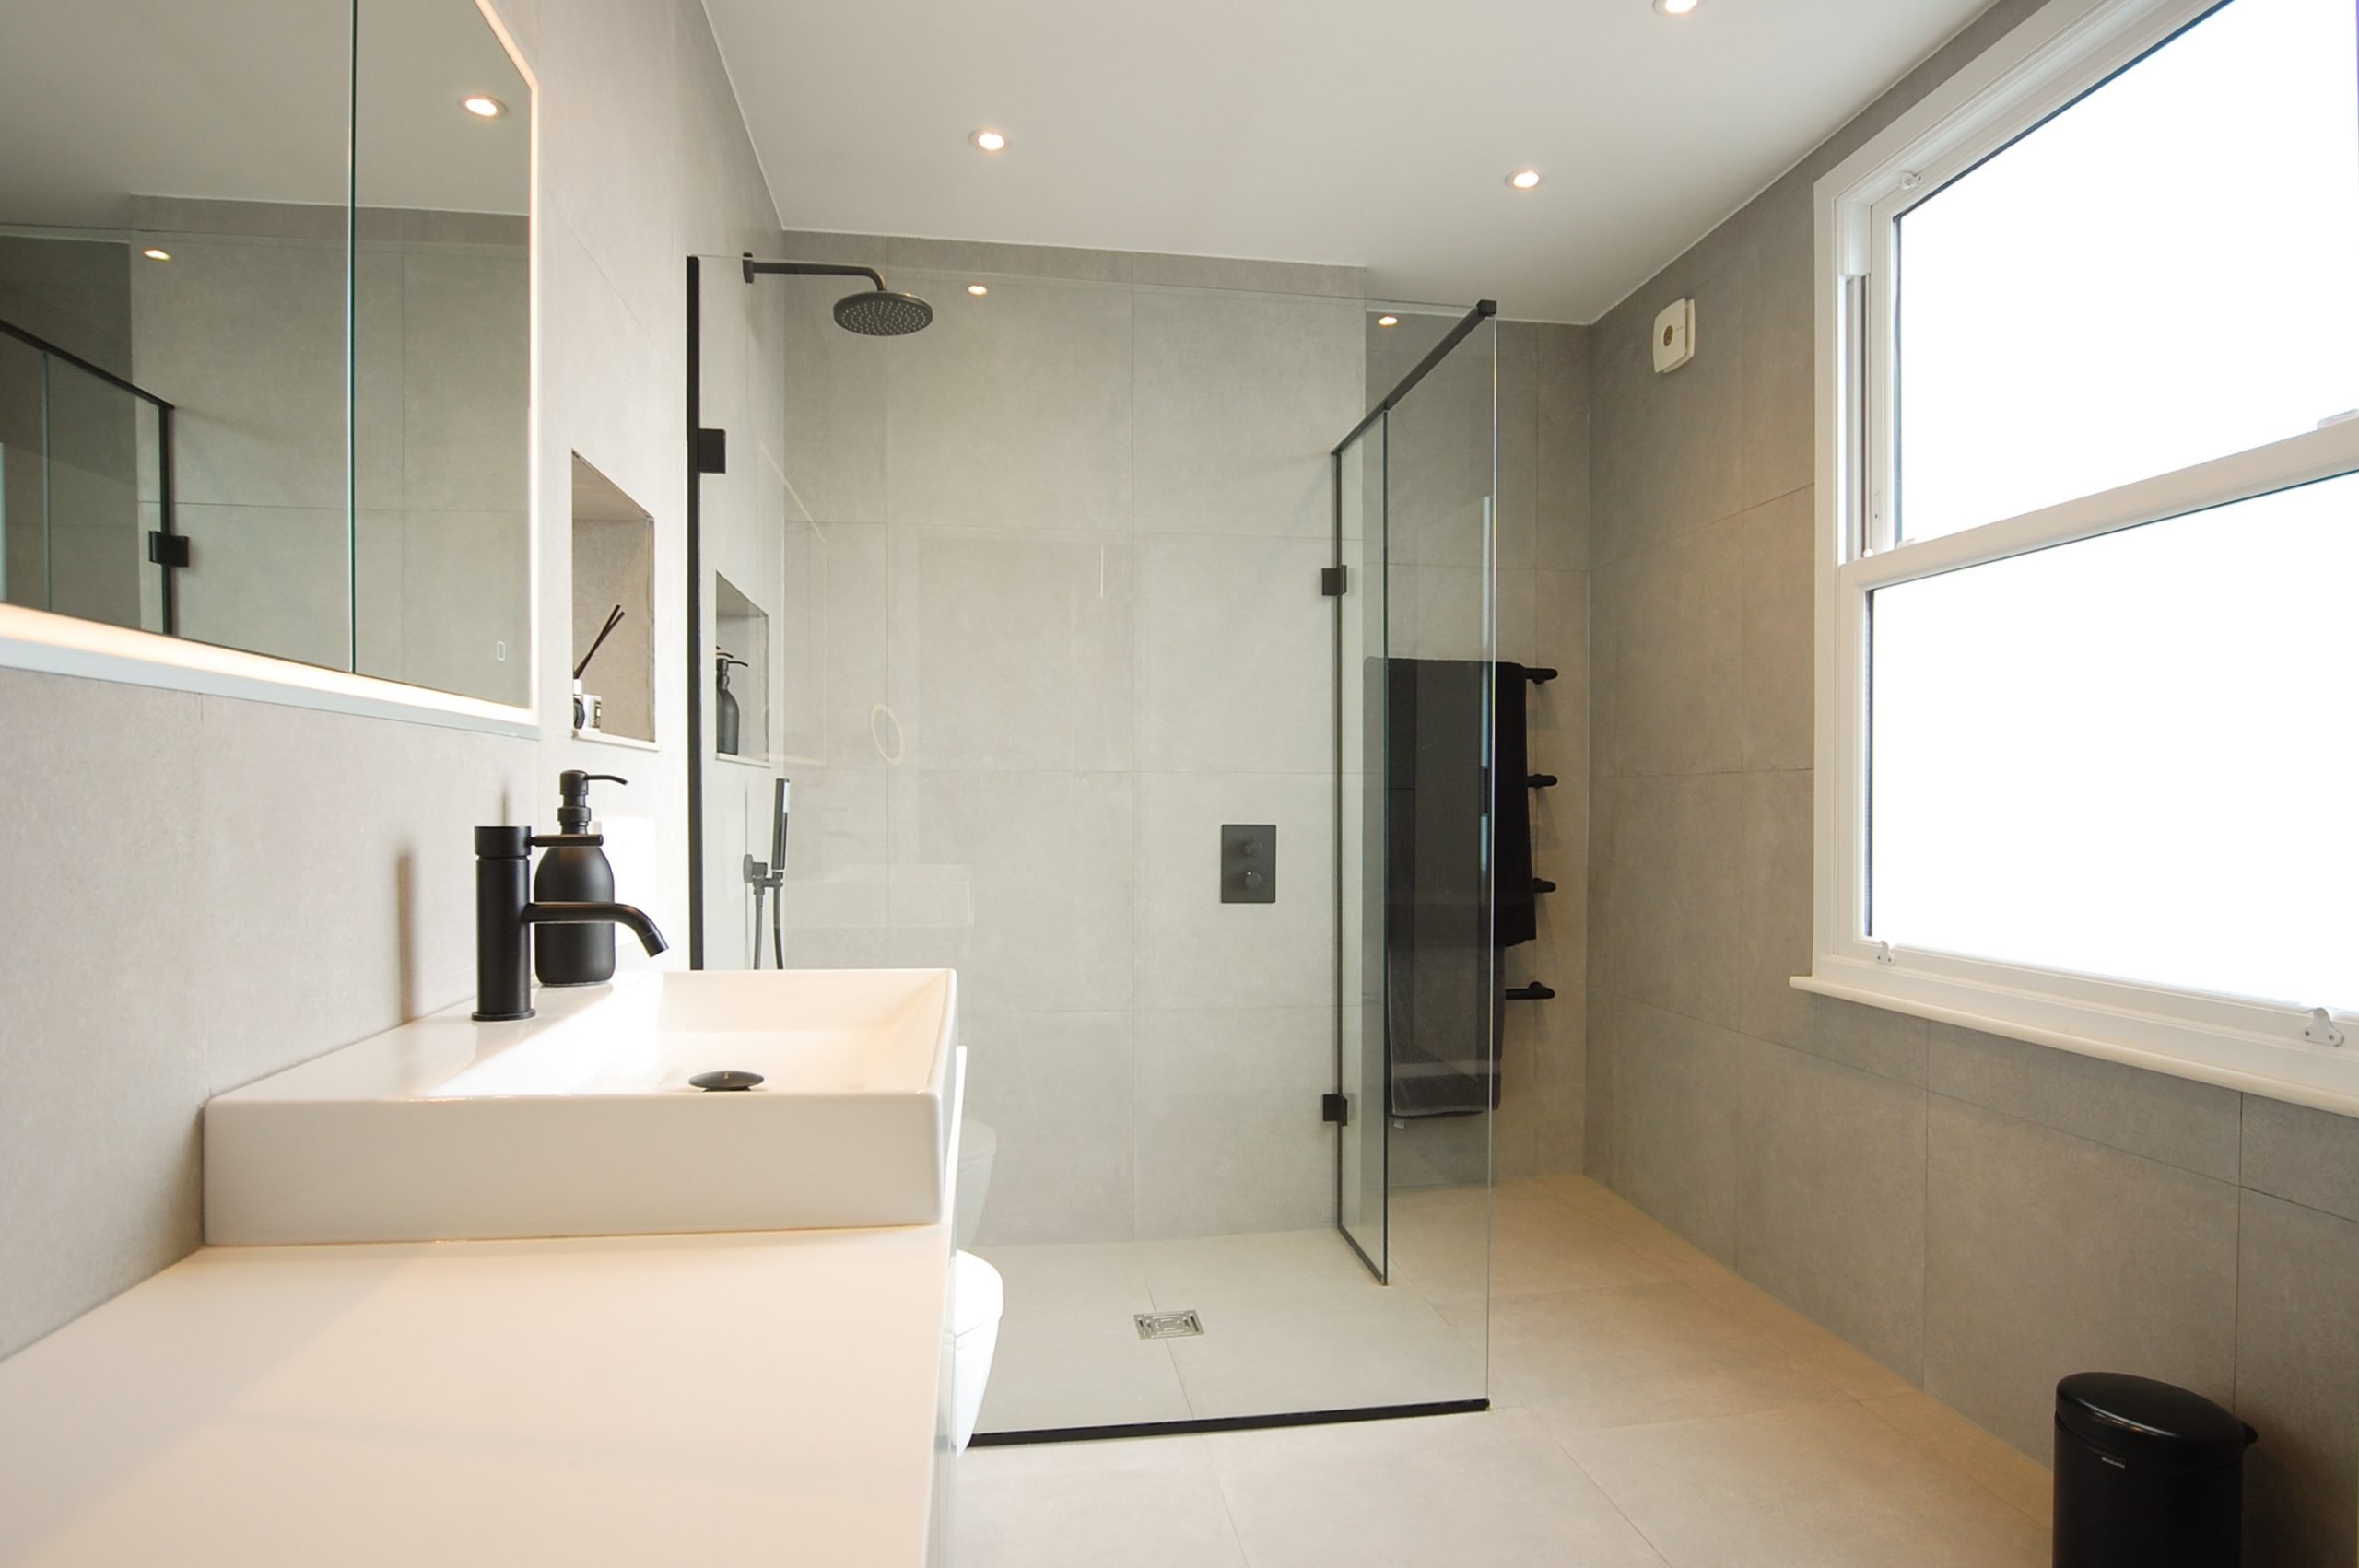 Park Crescent Residential Bathroom Installation London Shower